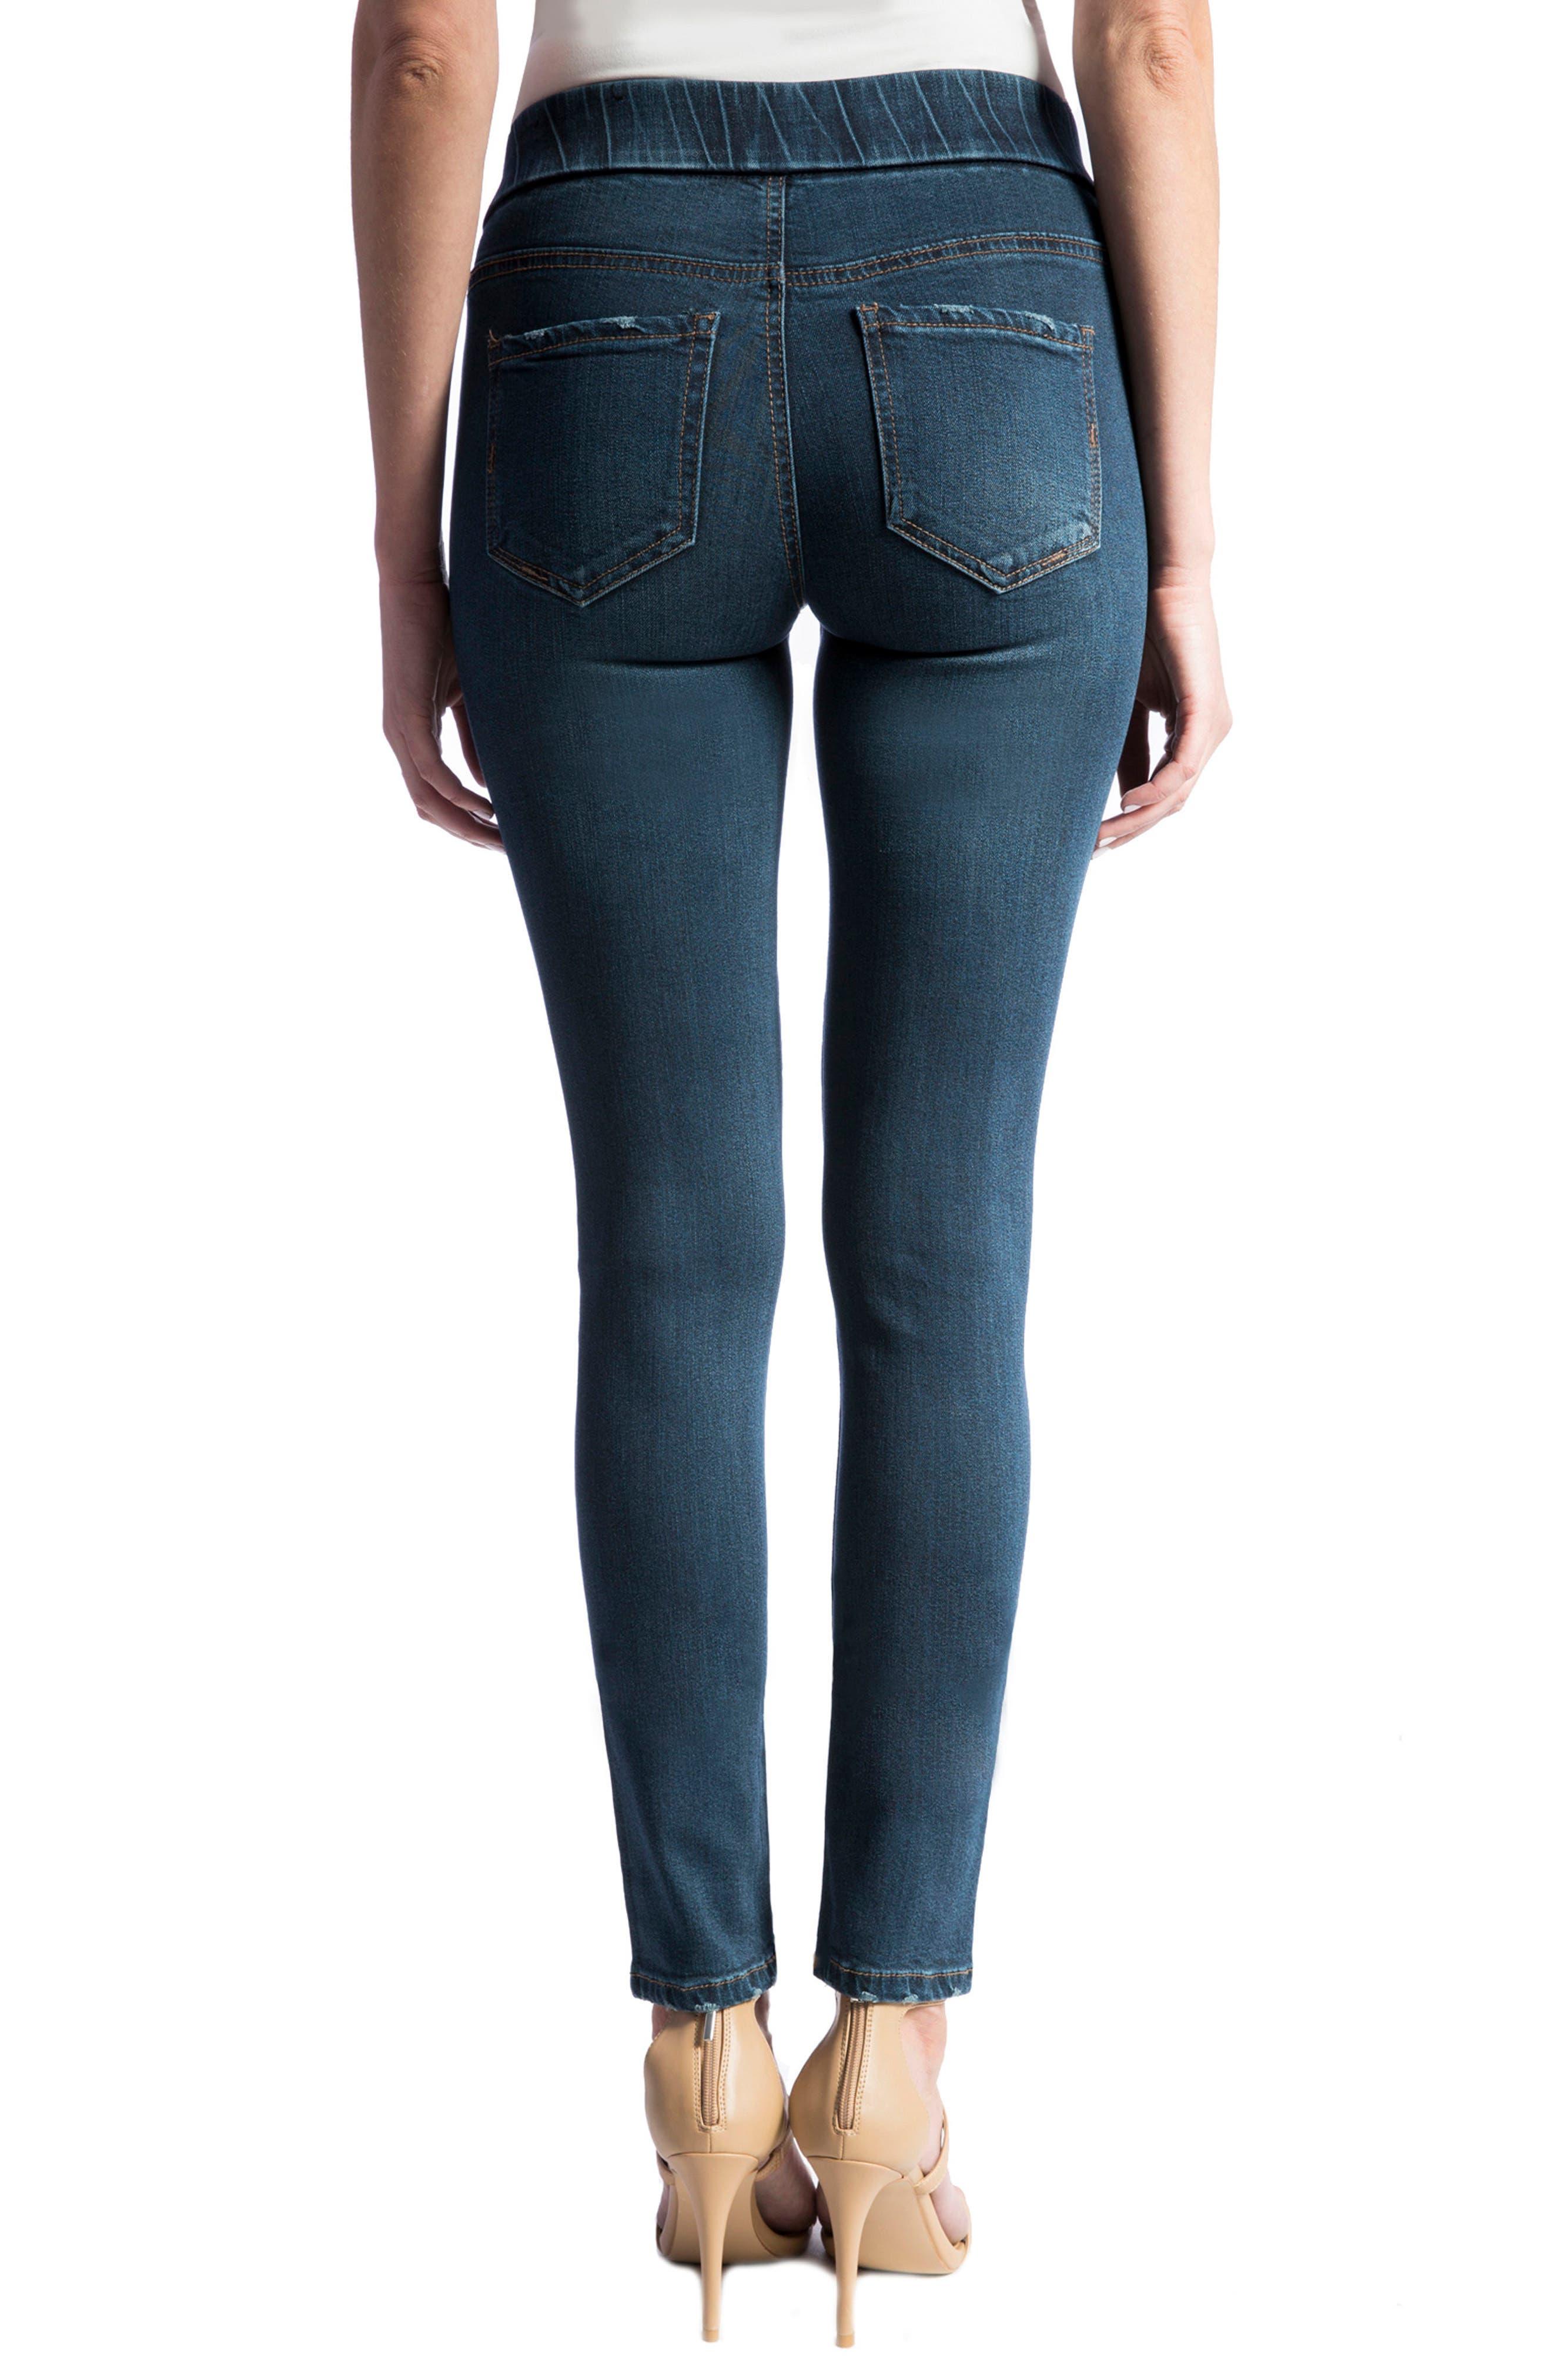 Jeans Company Sienna Mid Rise Soft Stretch Denim Leggings,                             Alternate thumbnail 8, color,